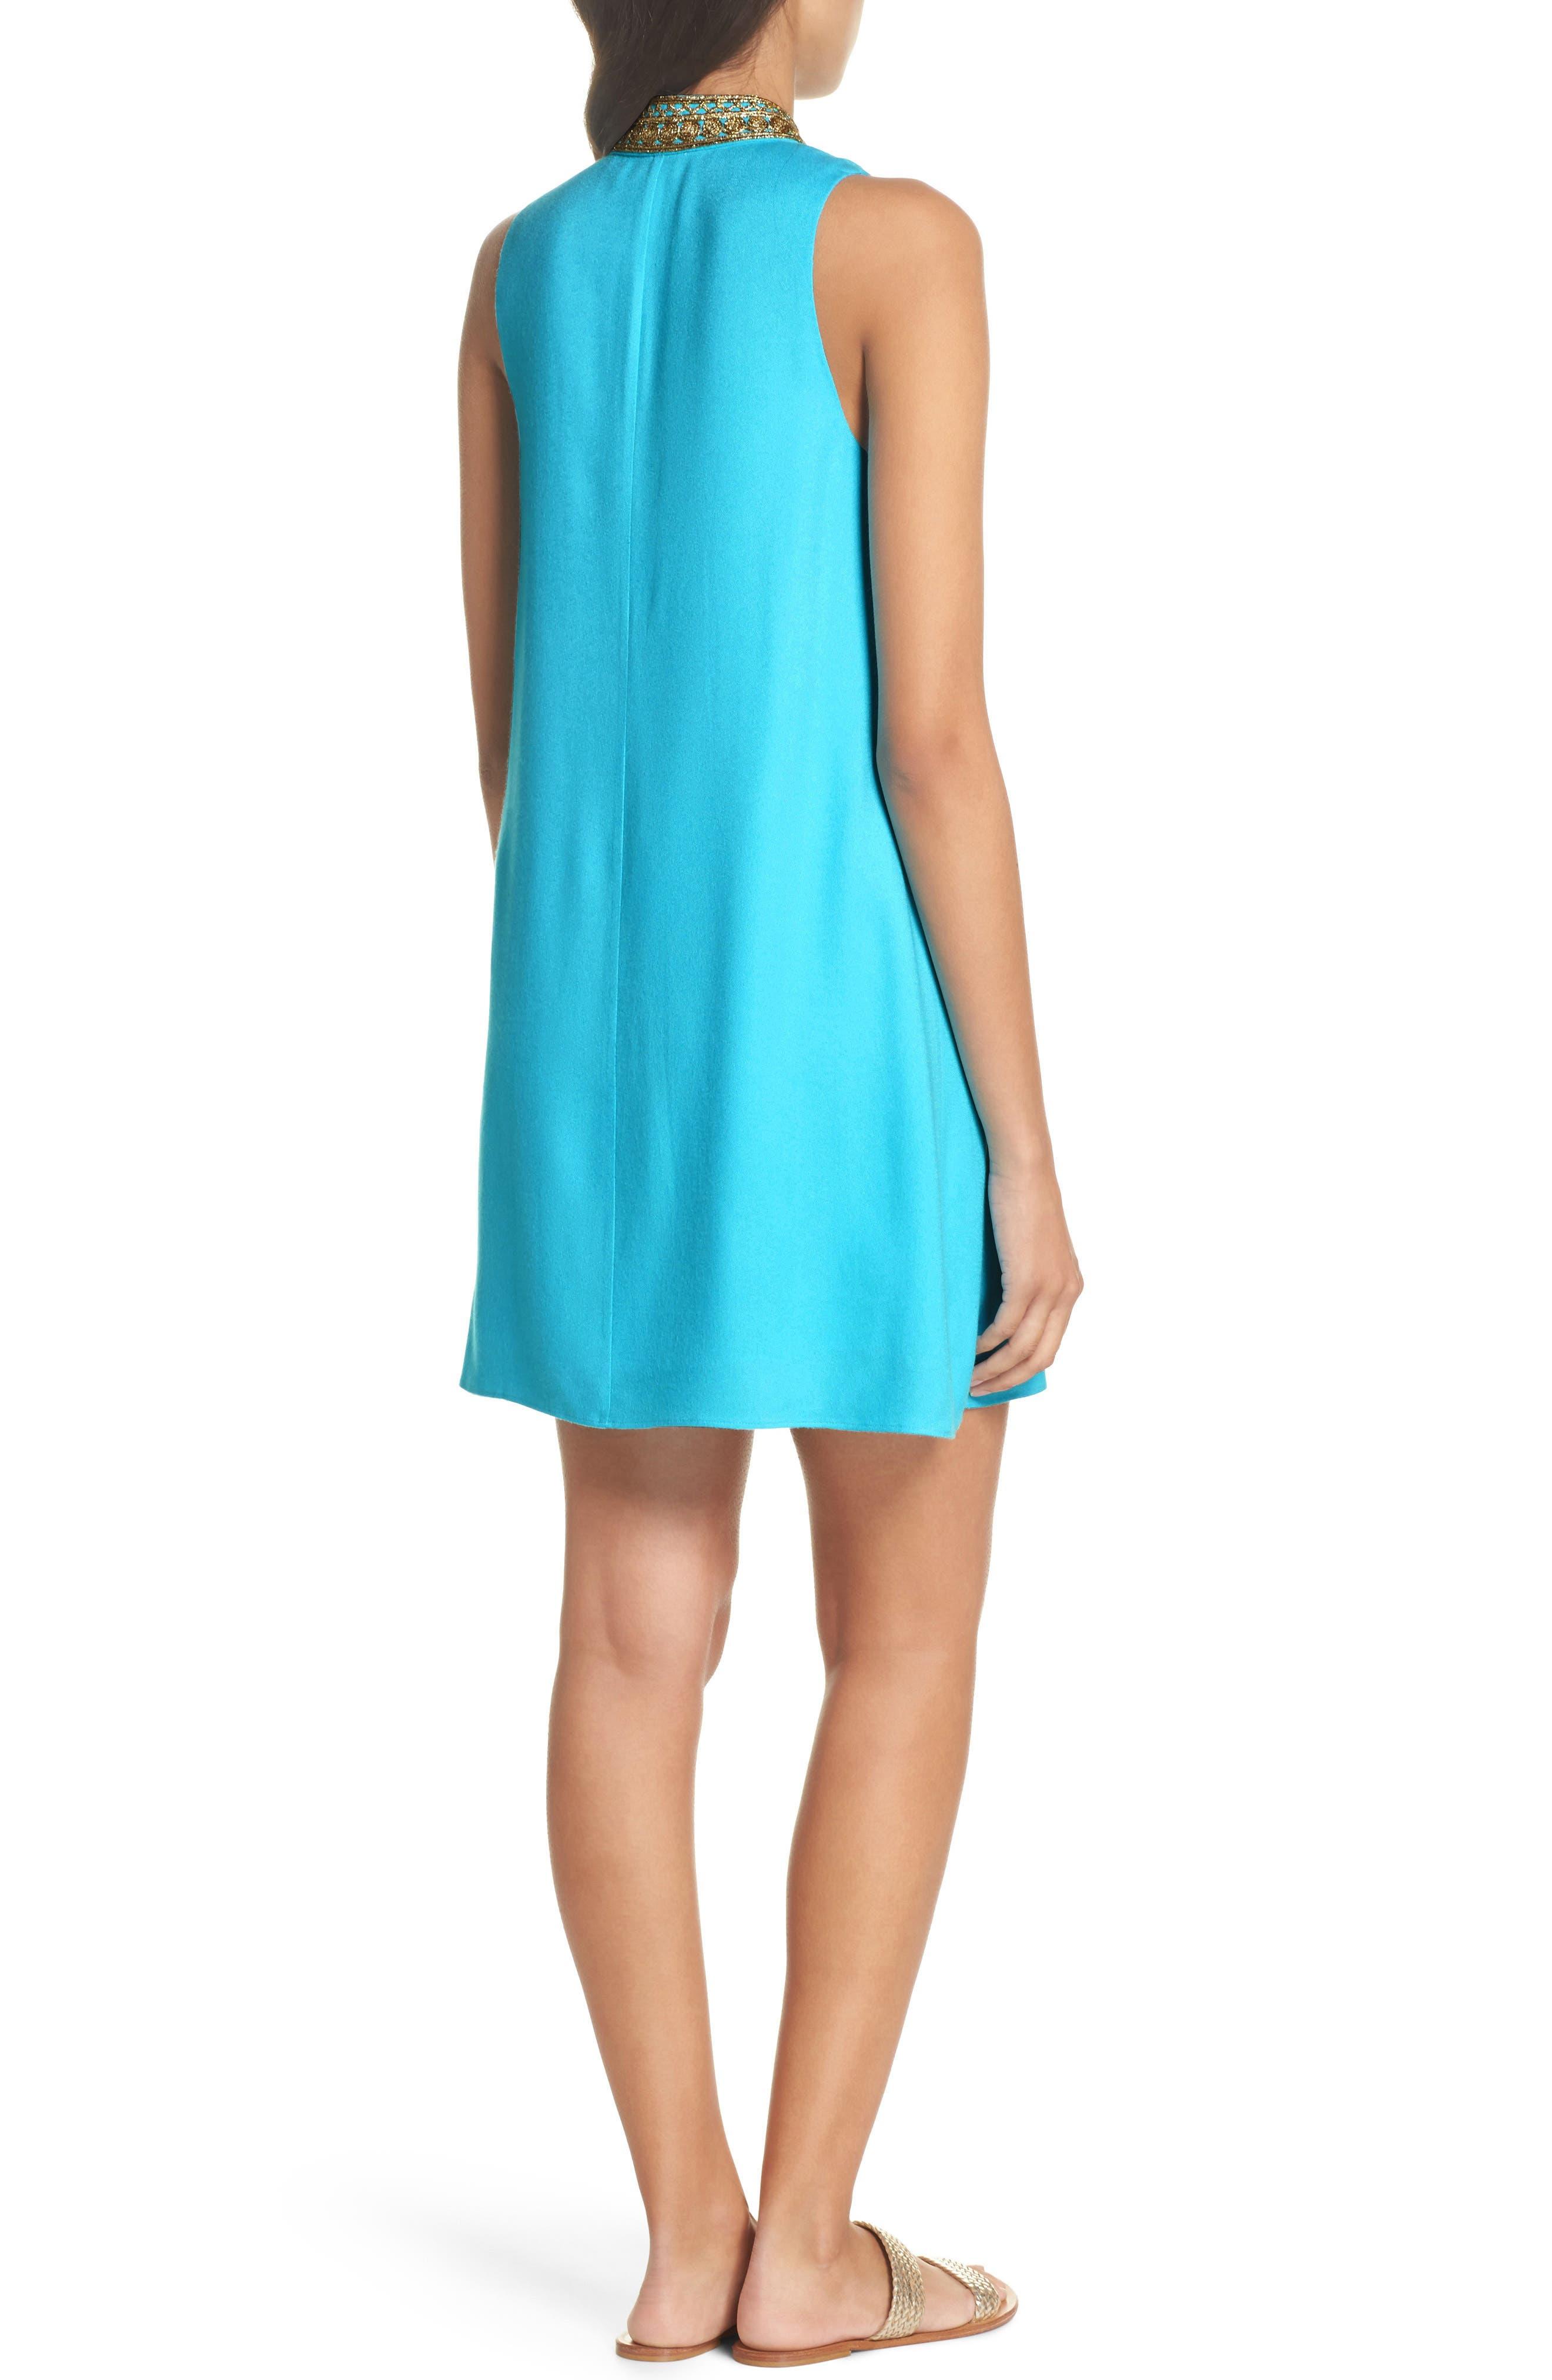 Jane Embroidered Shift Dress,                             Alternate thumbnail 2, color,                             Blue Ibiza